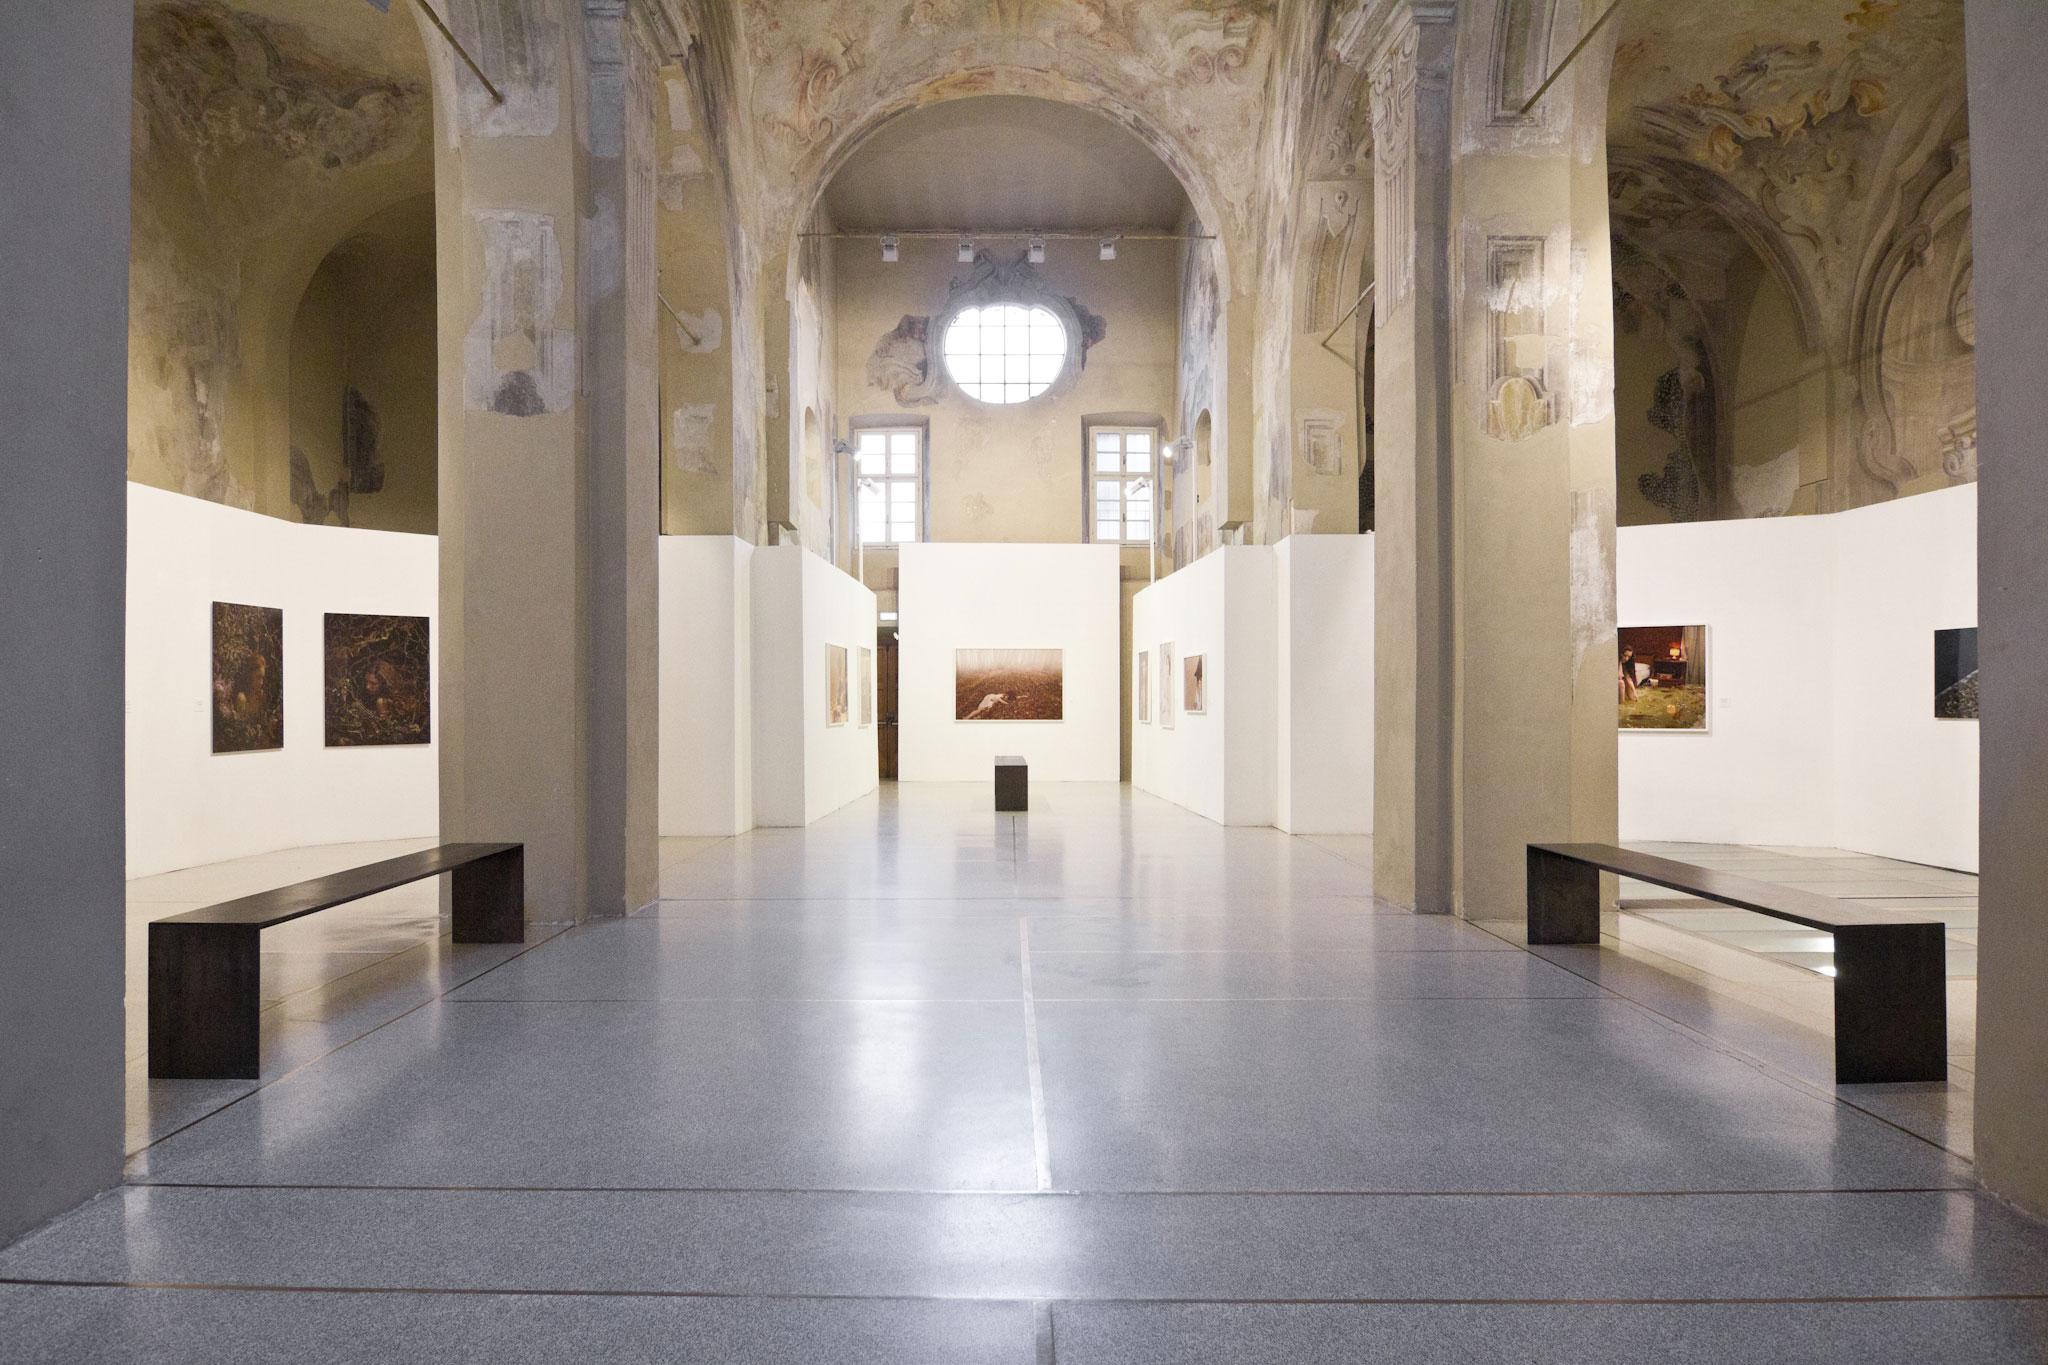 Tania & Lazlo's solo exhibithion in Como